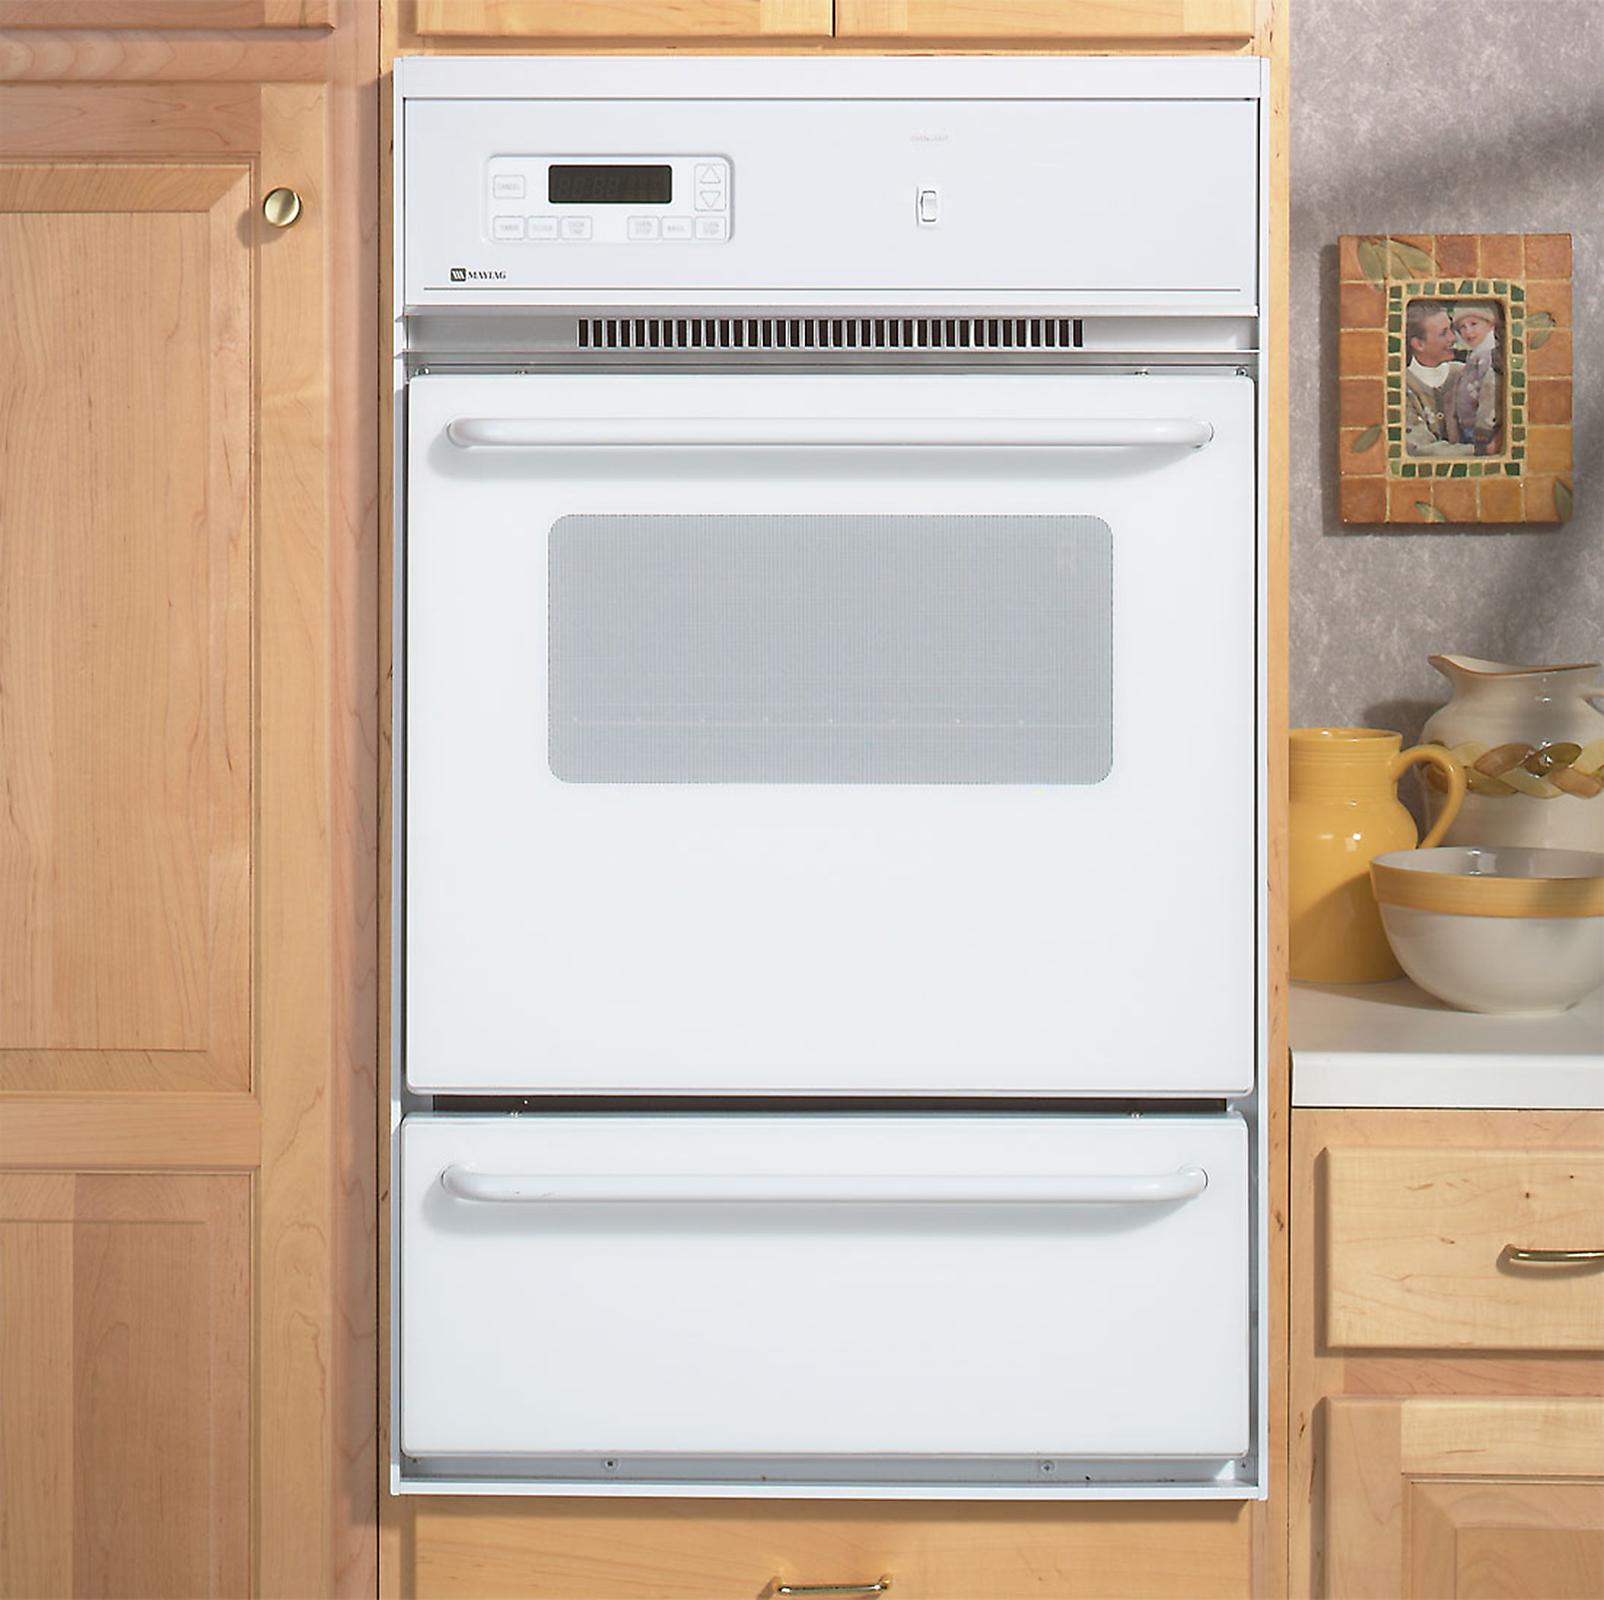 Maytag Cwg3100aae 24 Single Standard Clean Gas Wall Oven